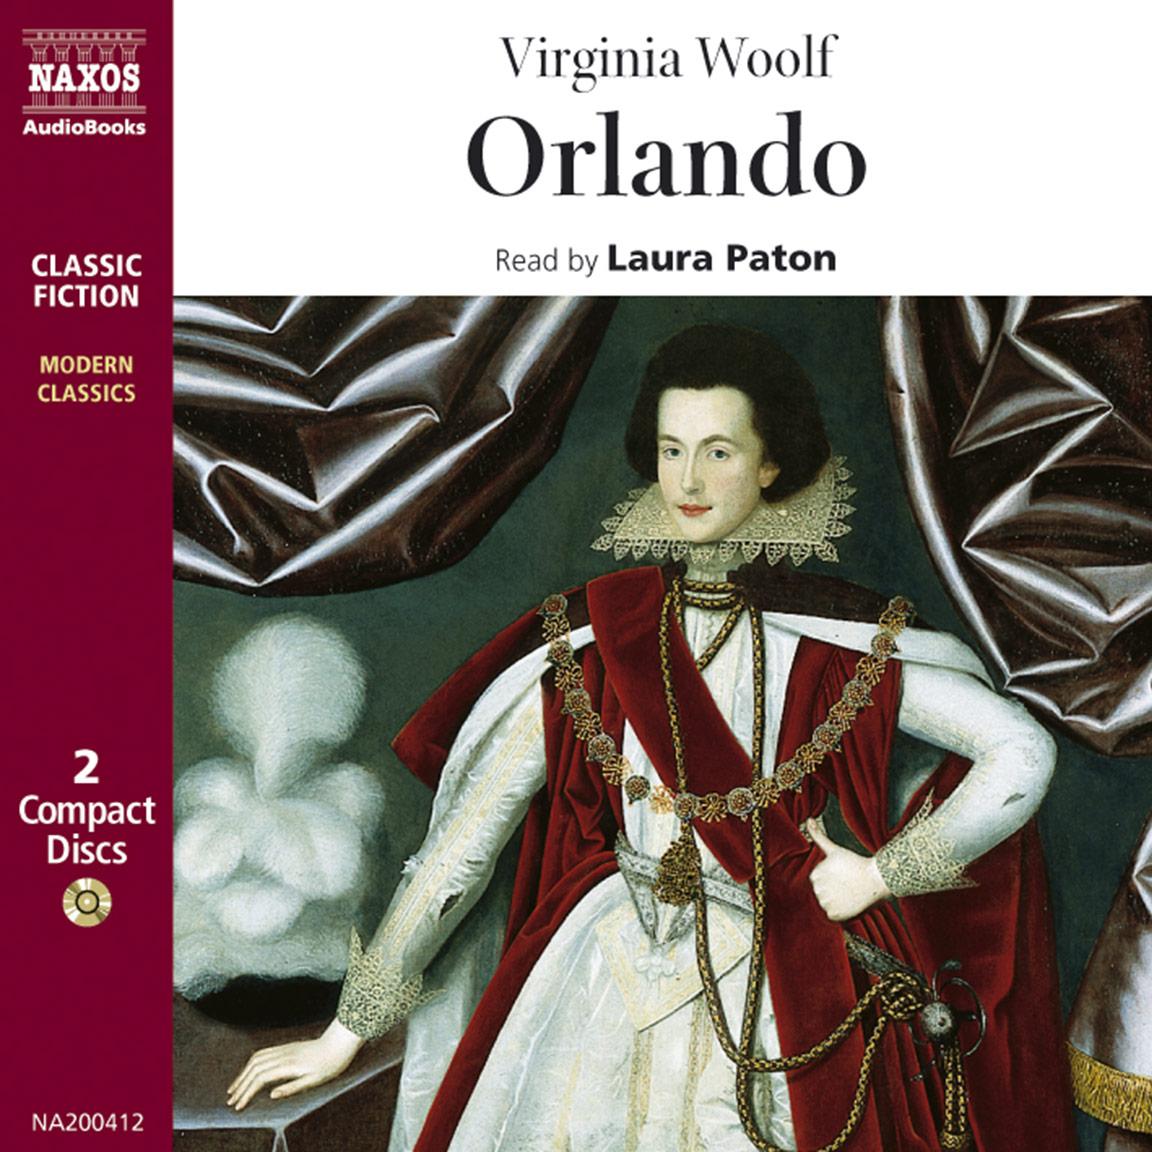 Orlando (abridged)